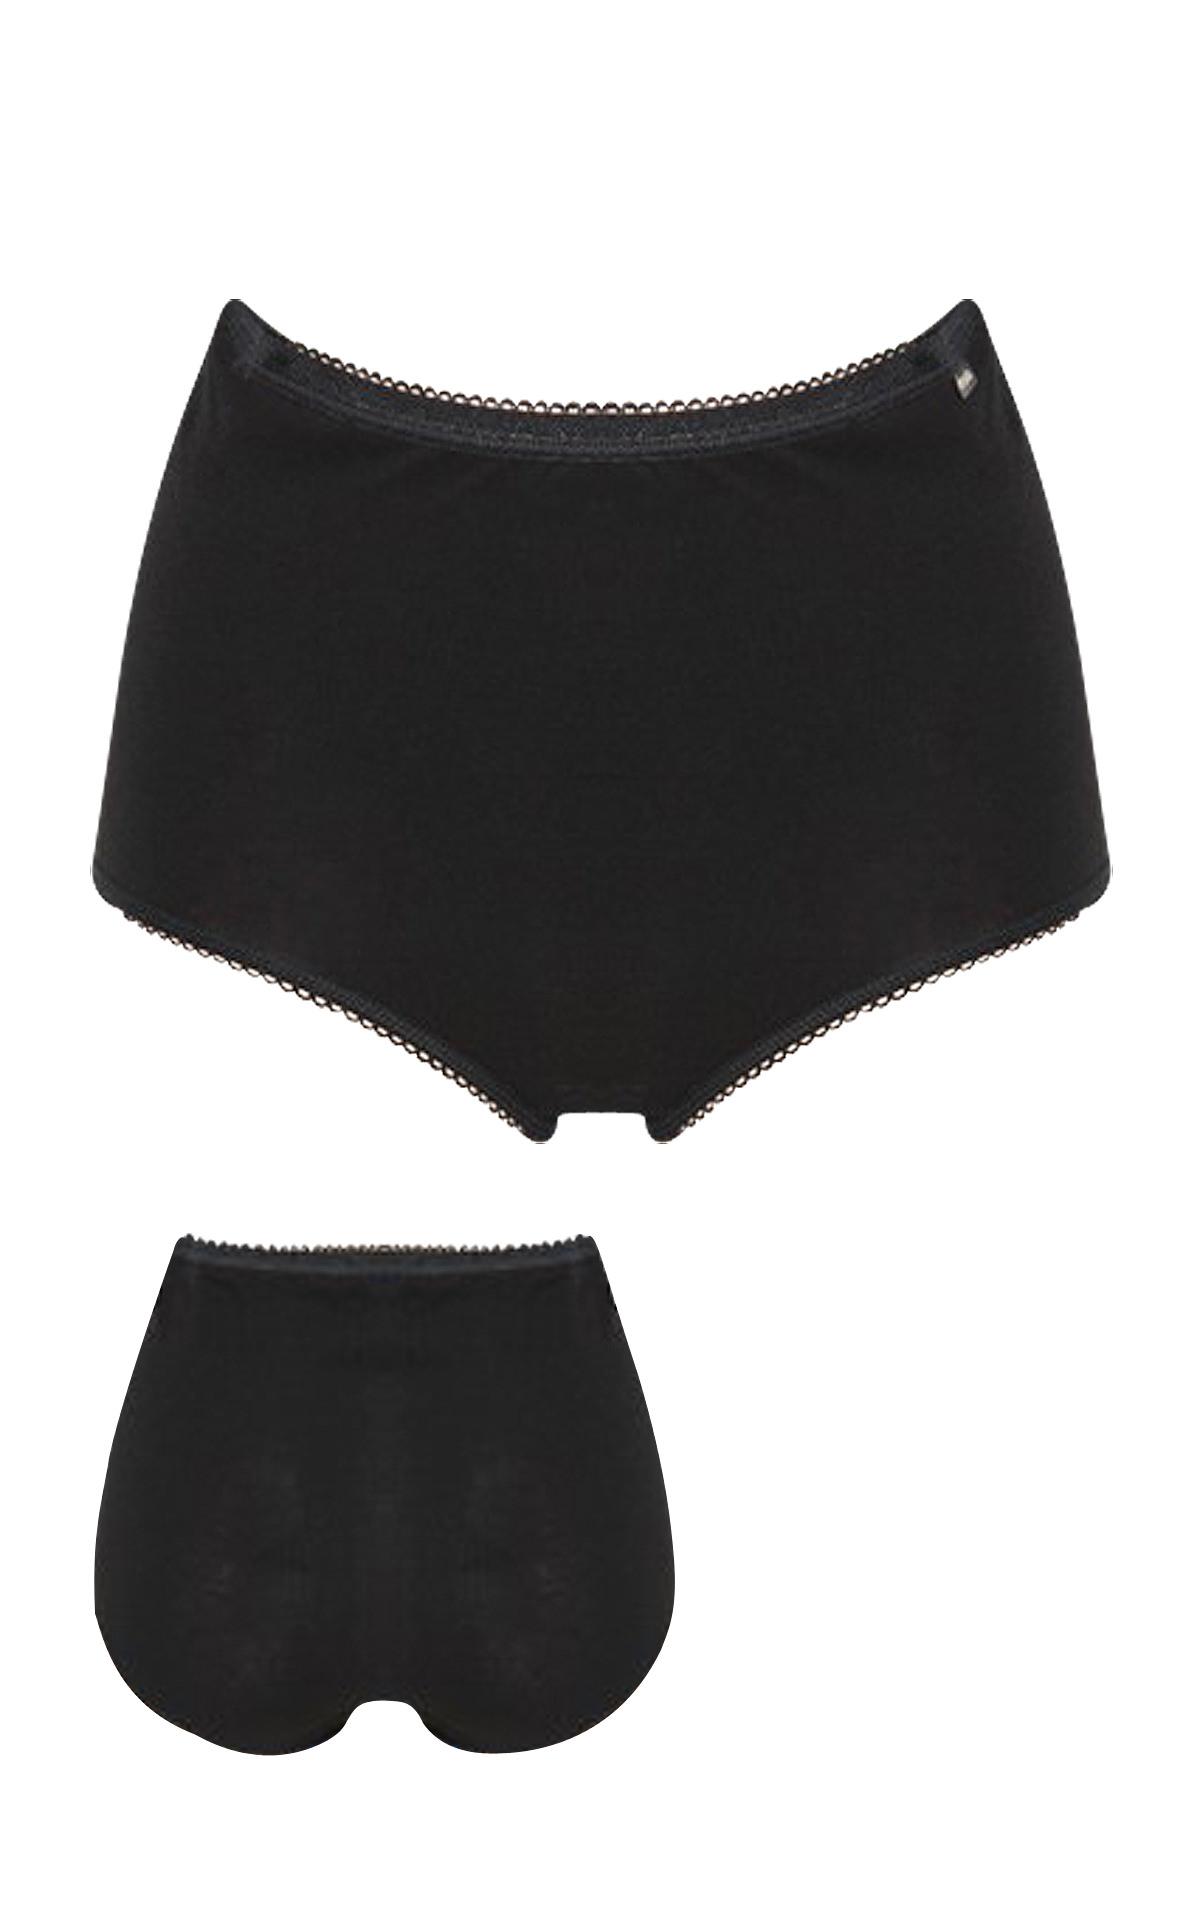 d711d4cdd24 Γυναίκα Εσώρουχα Everyday Slip Slip Cotton - Lycra Maxi 2 τεμάχια